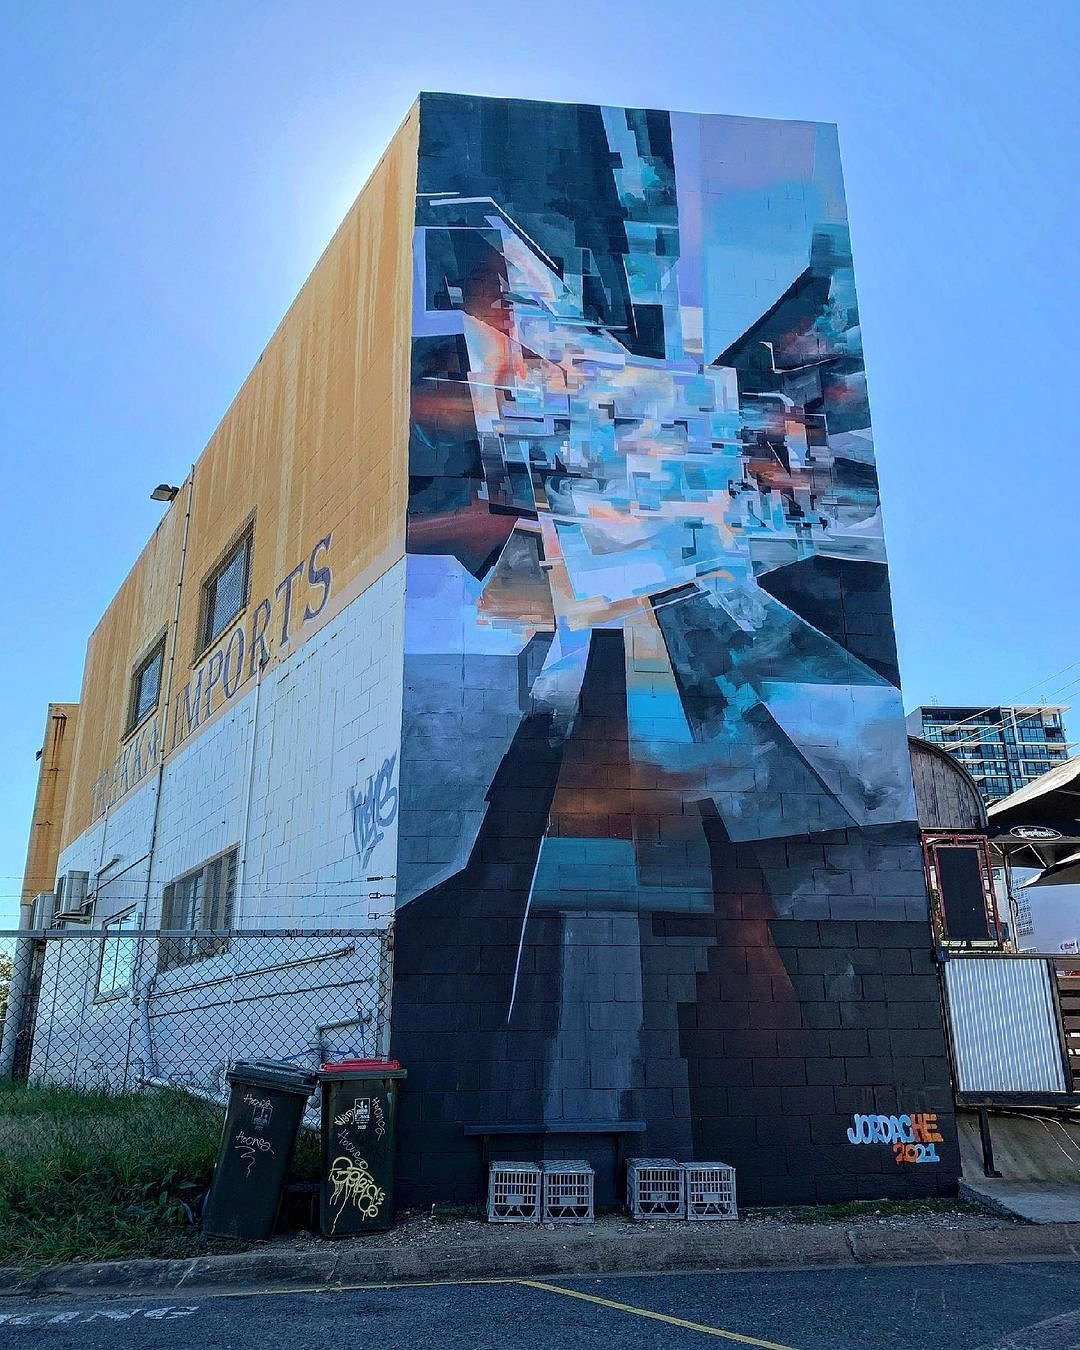 Jordache @ Brisbane, Australia